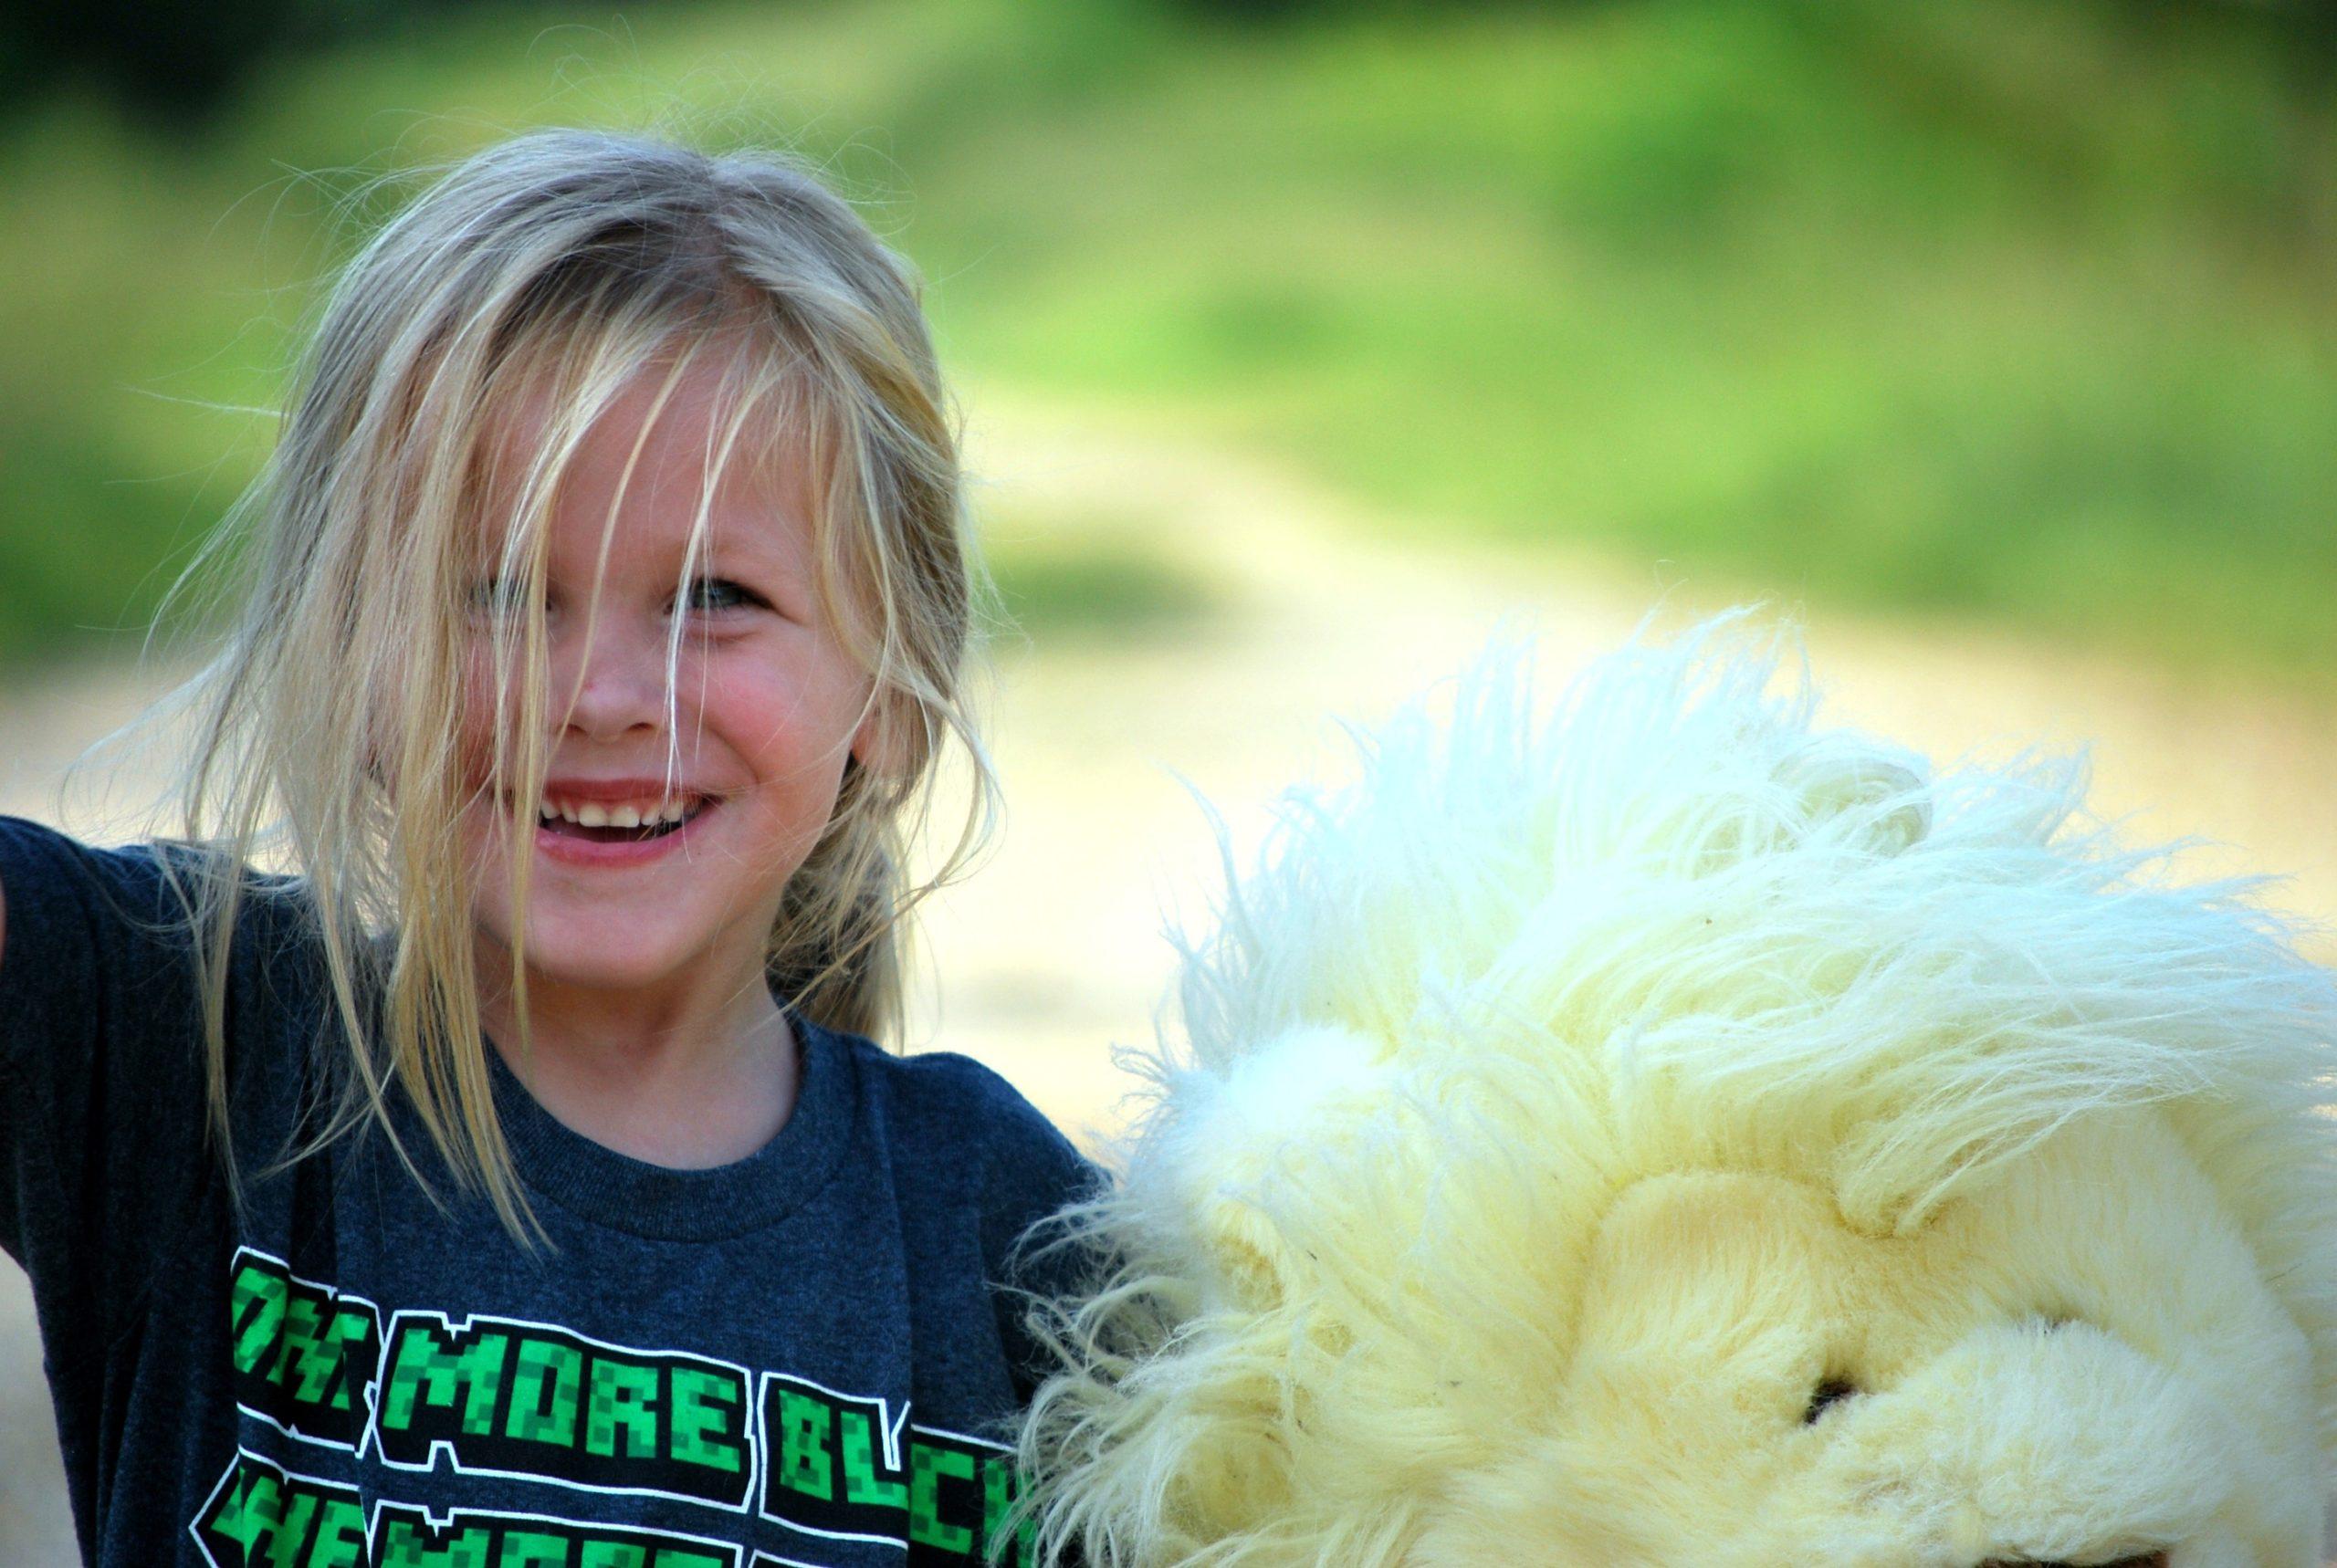 Kind Mädchen Junge Neurofibromatose Spenden Bundesverband